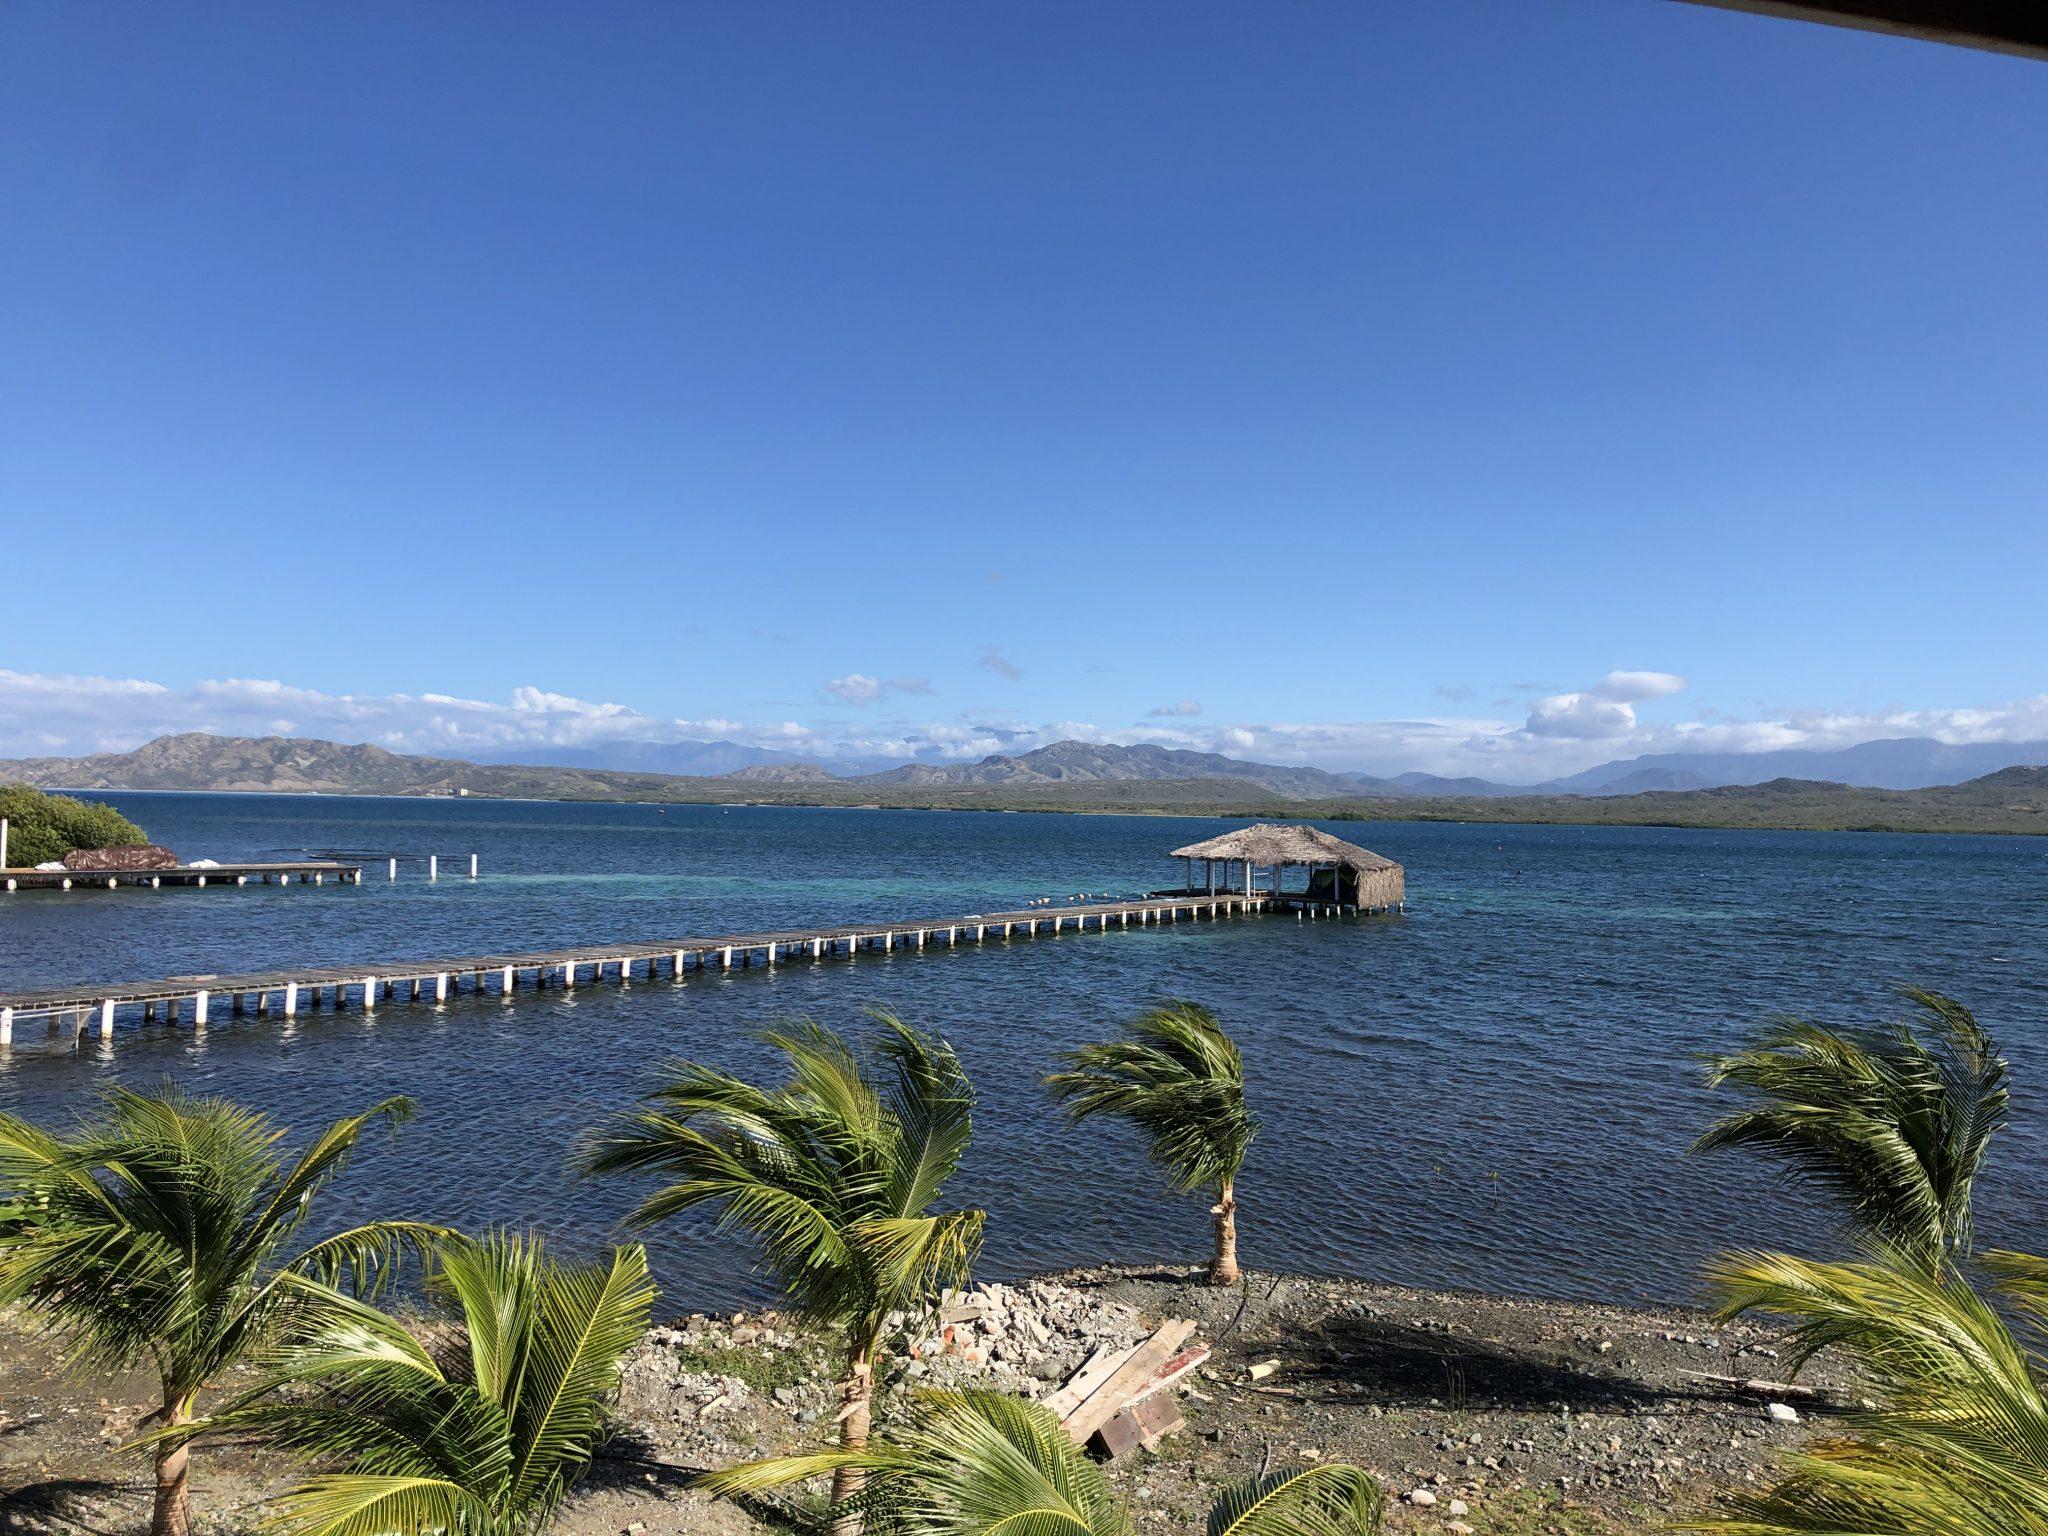 view of palm trees and ocean salinas de bani